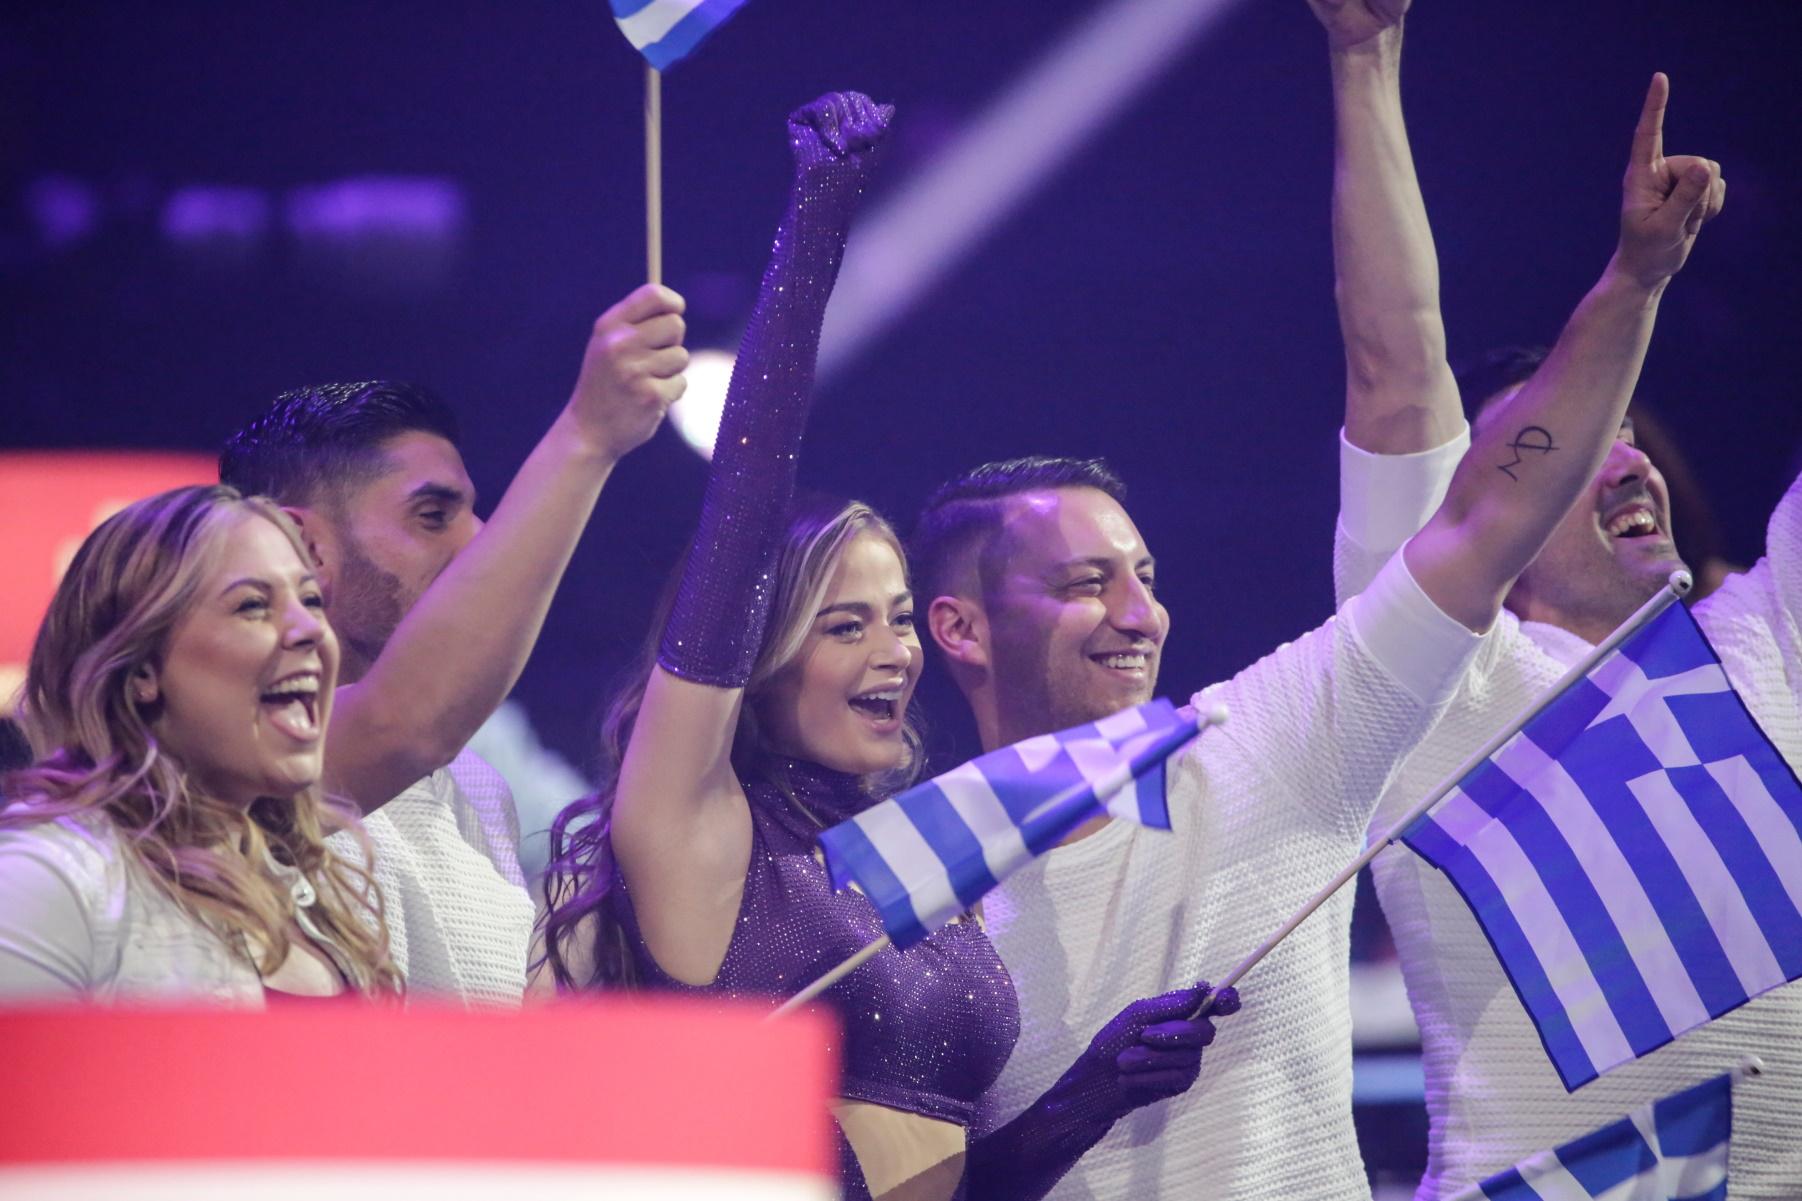 Eurovision 2021: Σε ποια θέση θα διαγωνιστεί η Stefania – Καλή επιτυχία, Ελλάδα!